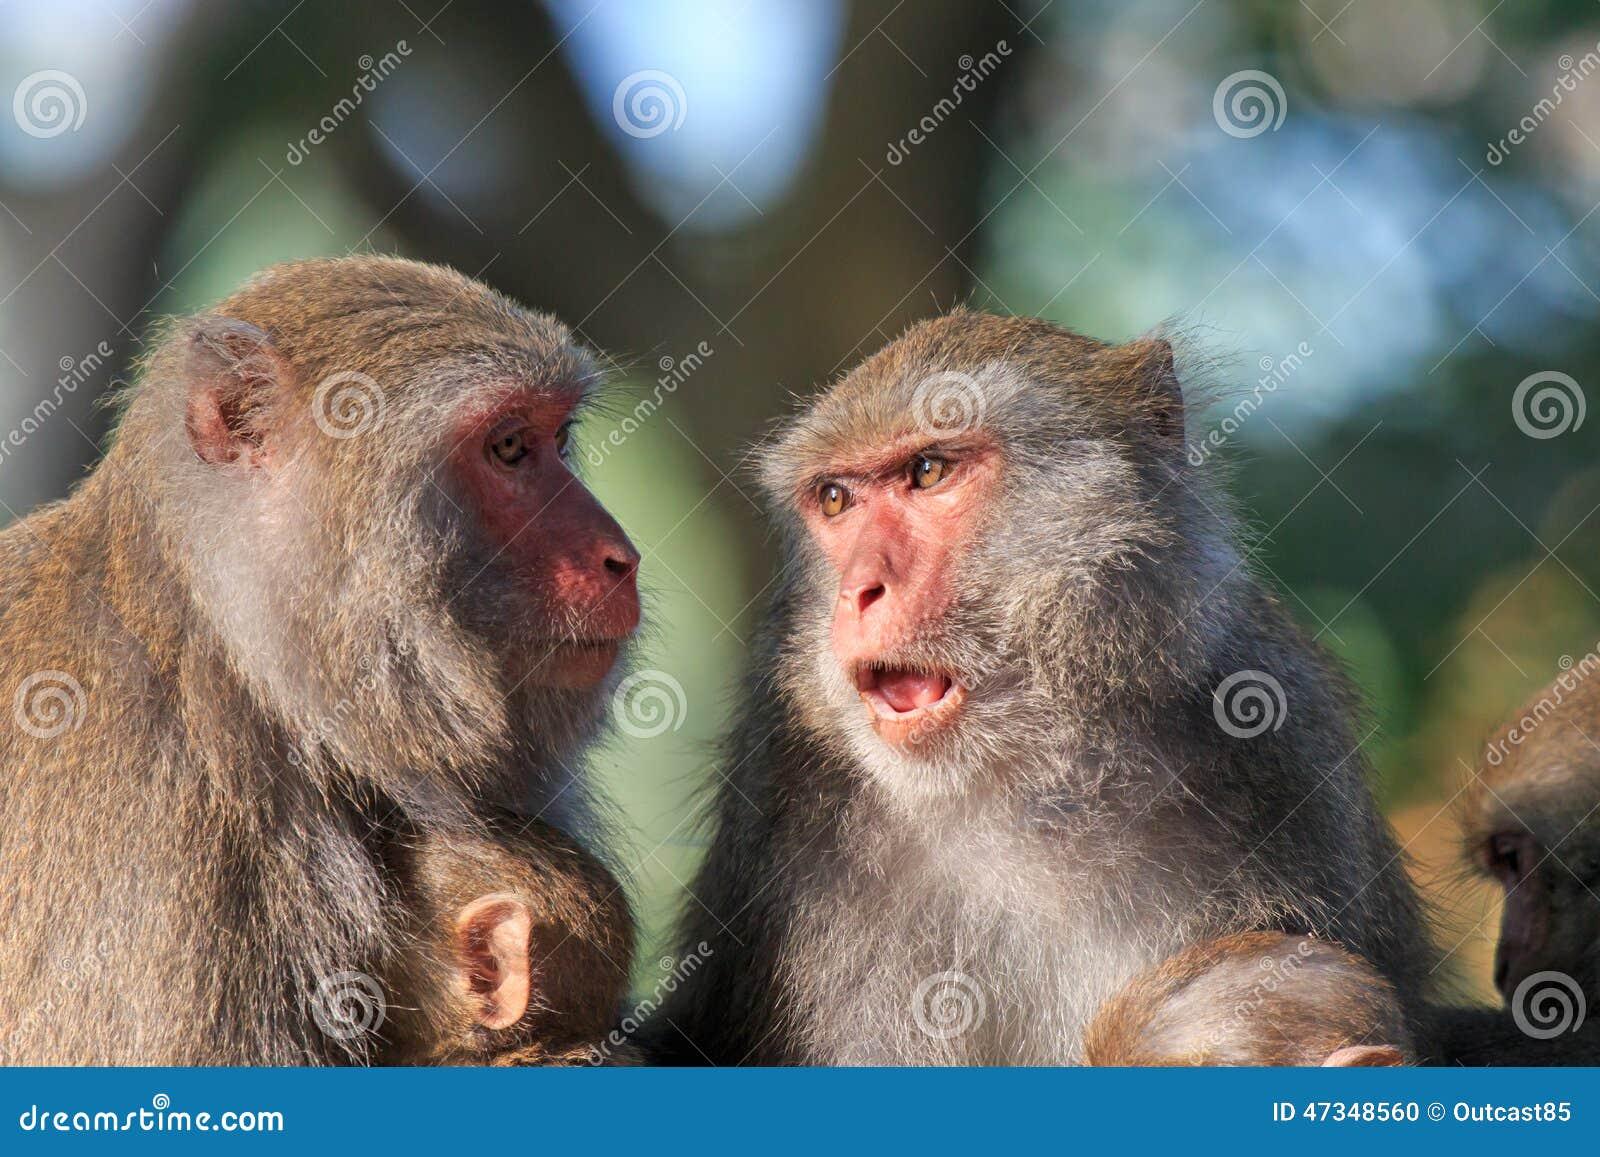 Mountain Monkeys